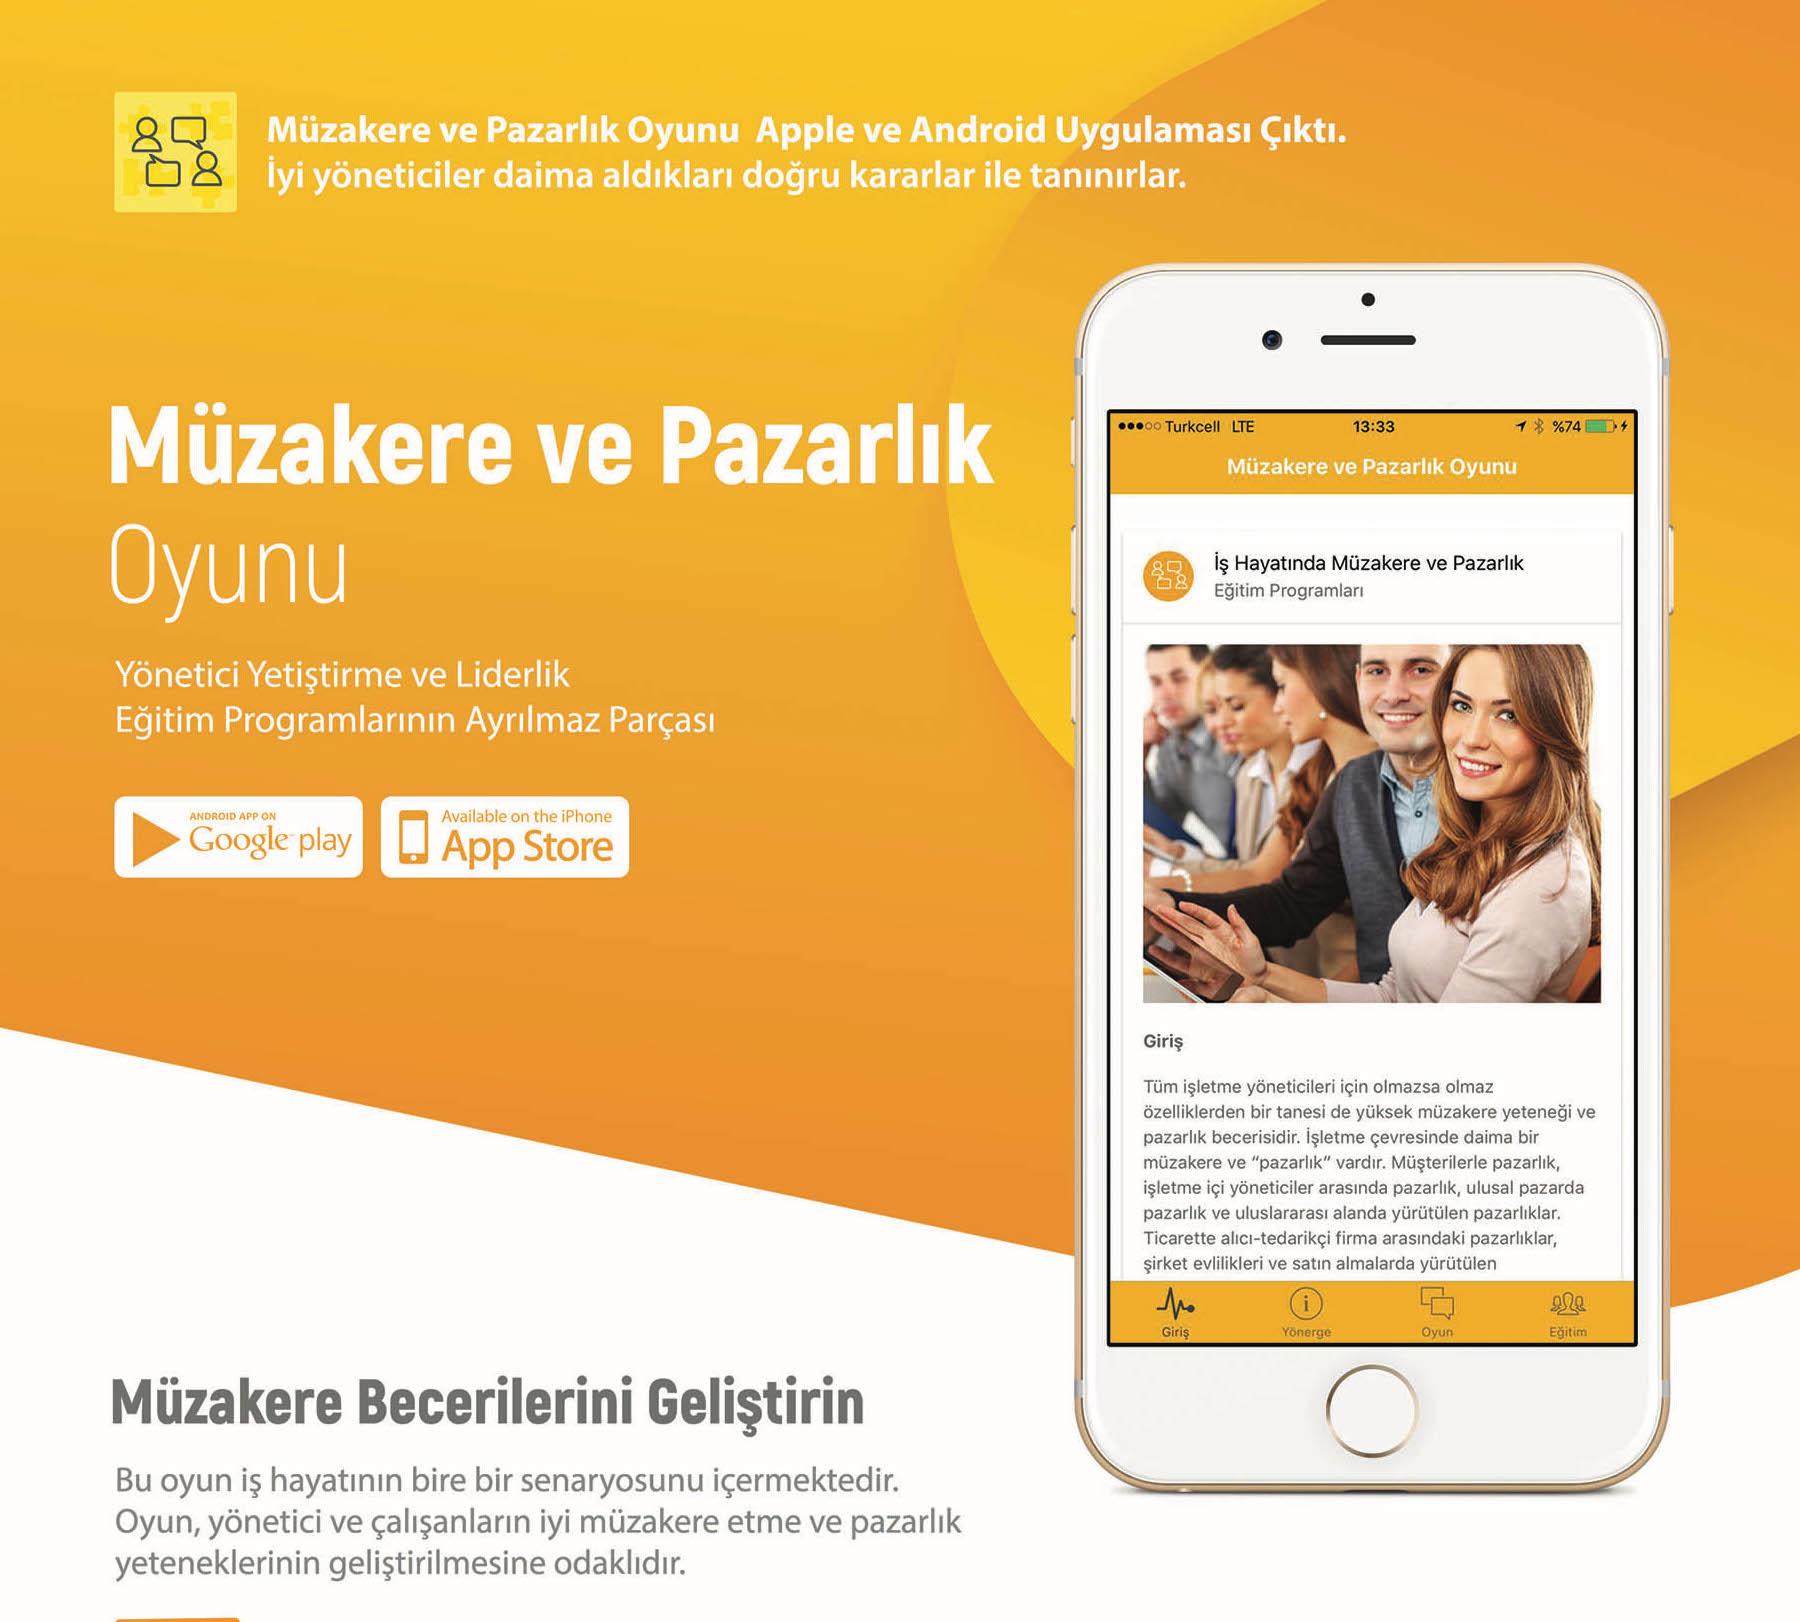 http://tedarikzinciri.org/wp-content/uploads/2015/12/muzakere-oyunu-1.jpg